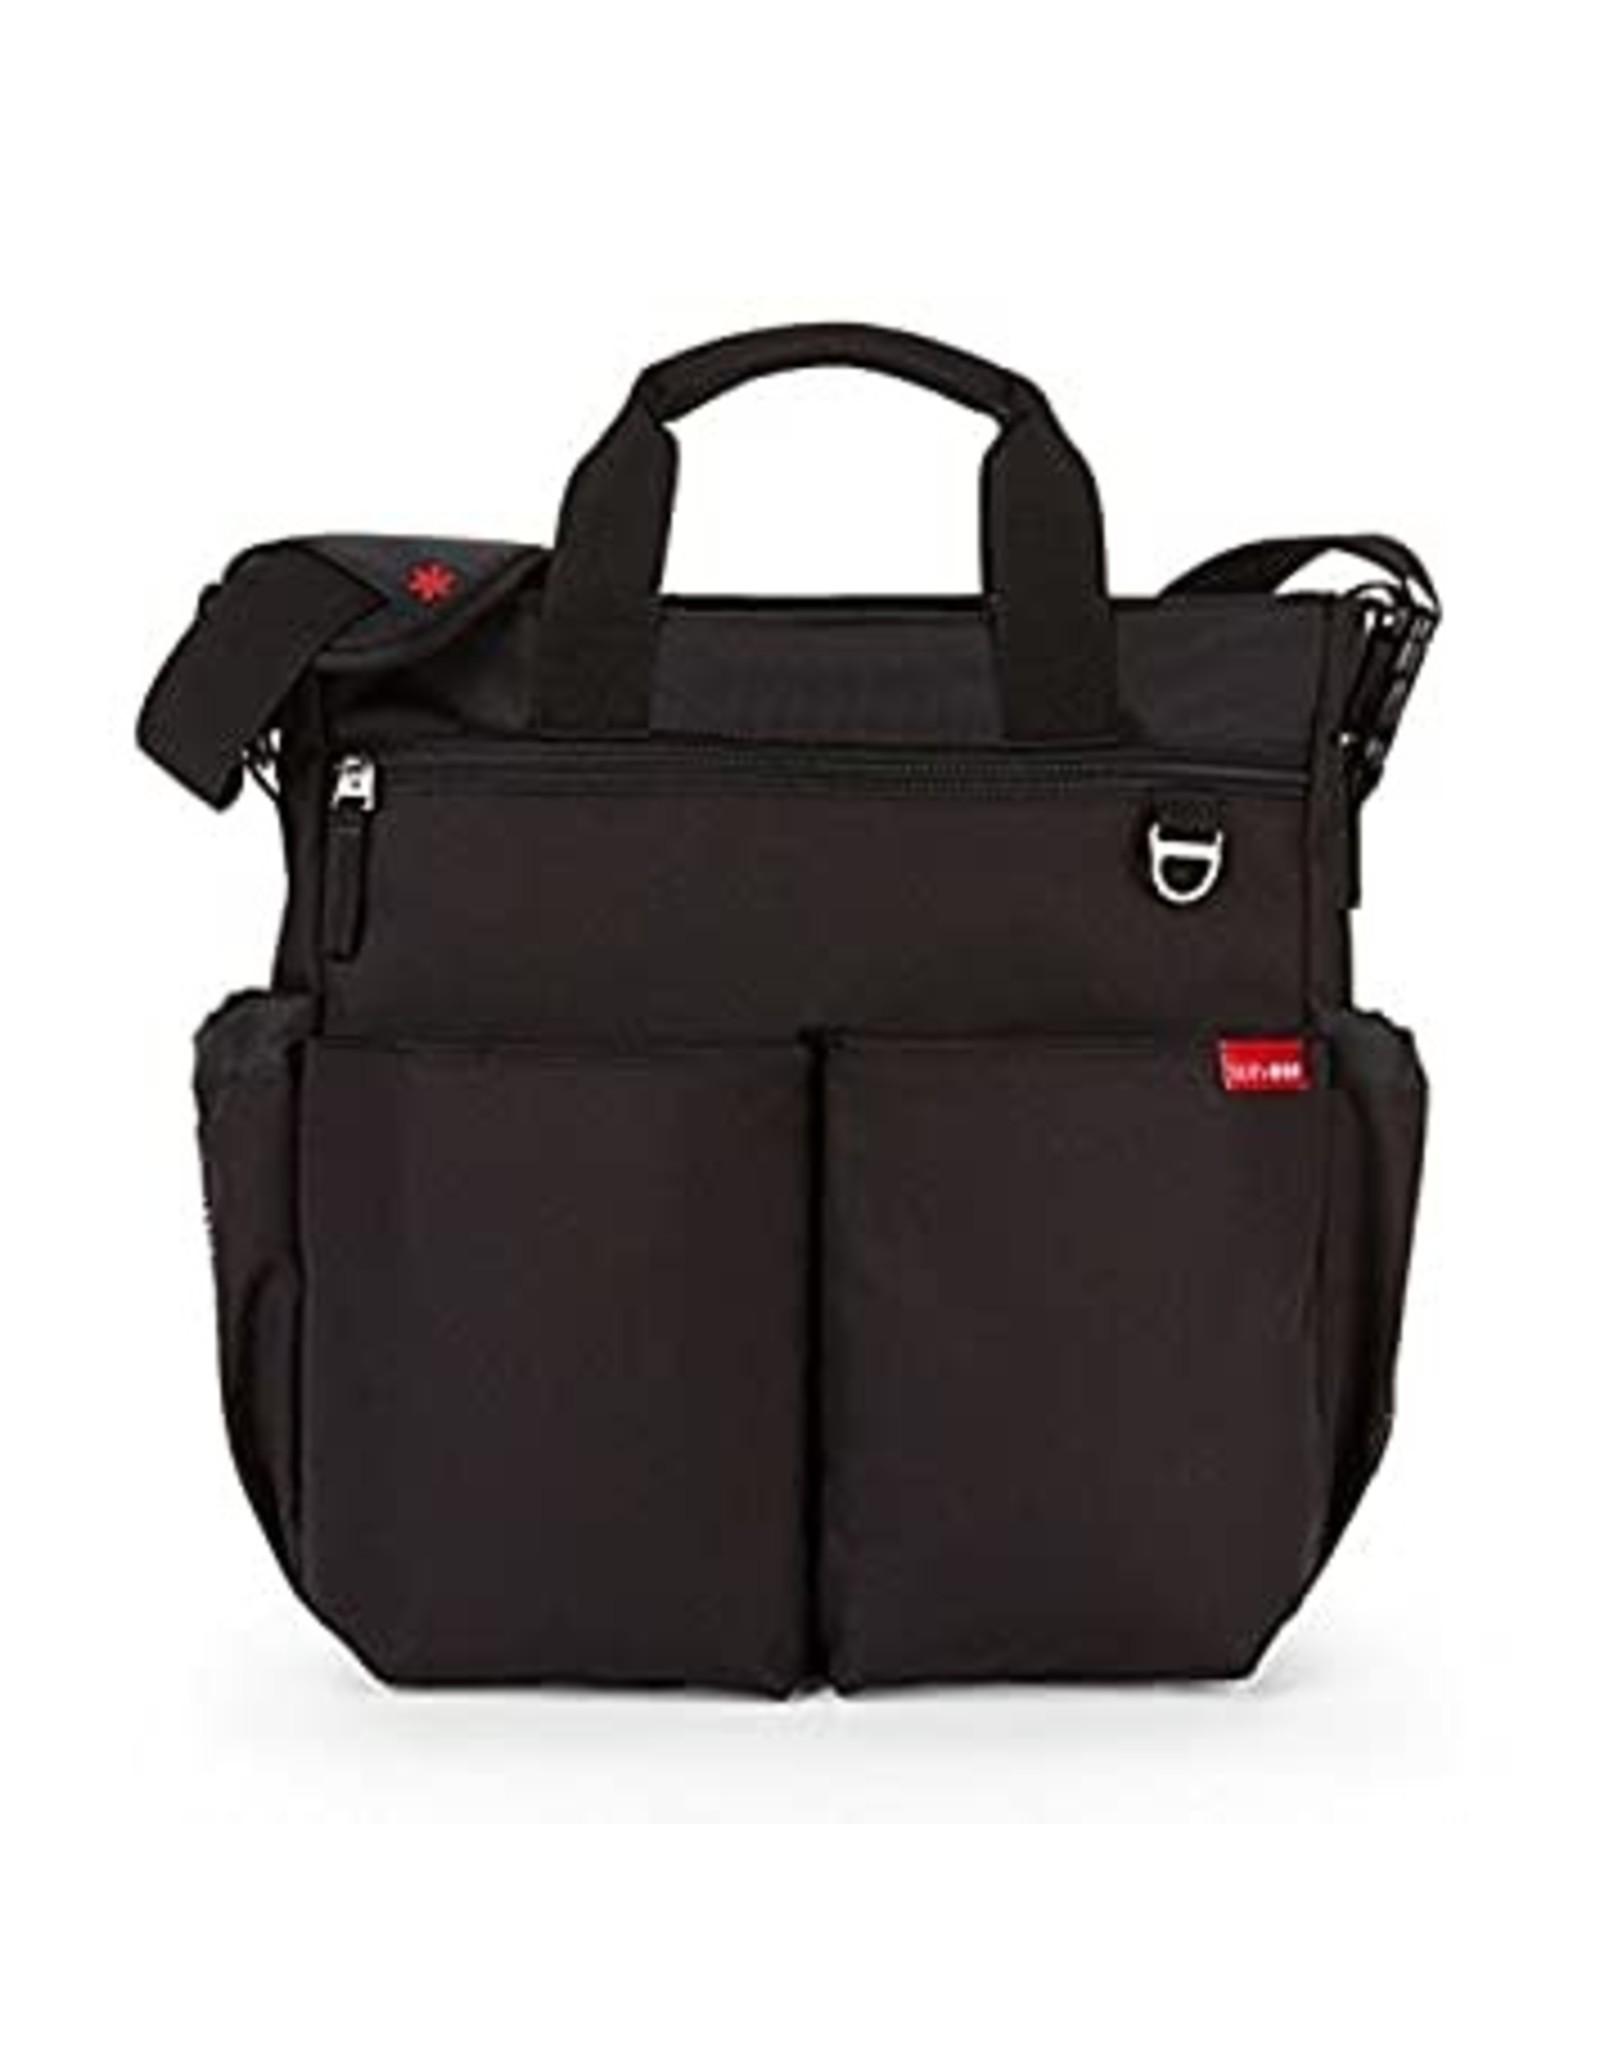 Skip Hop Duo Signature Diaper Bag, Black